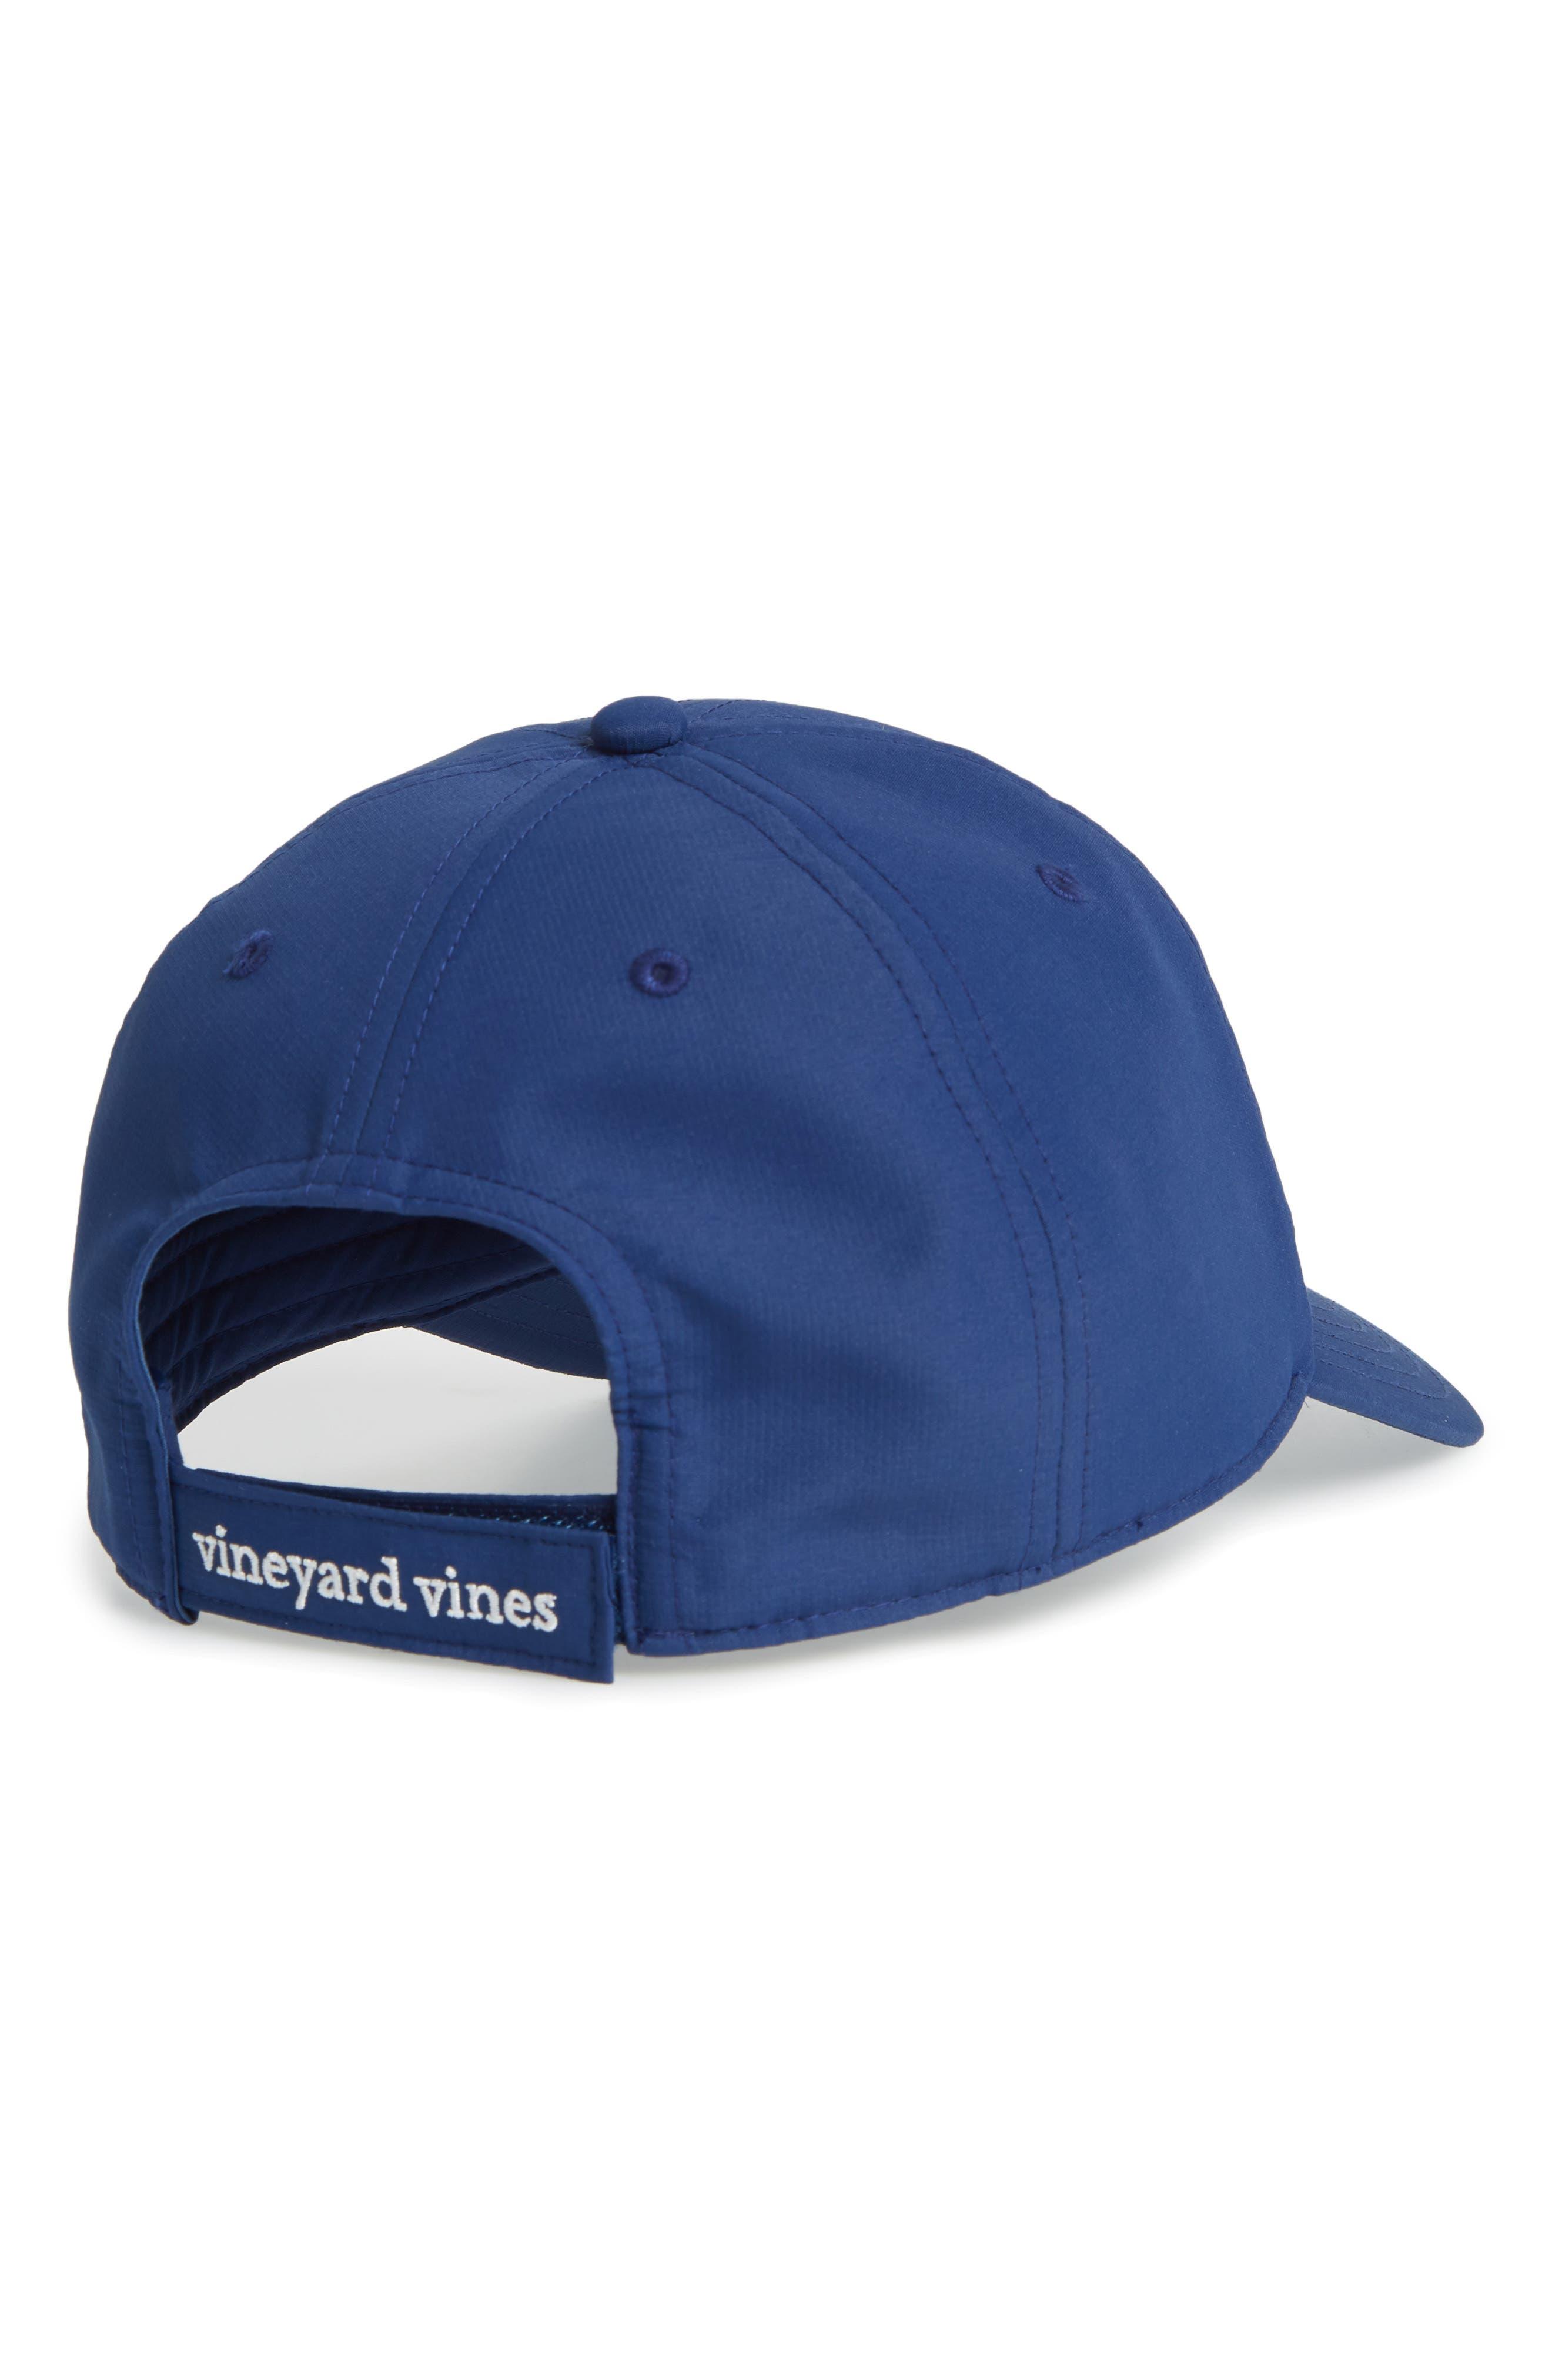 VINEYARD VINES,                             x Shark Week<sup>™</sup> Performance Baseball Cap,                             Alternate thumbnail 2, color,                             461